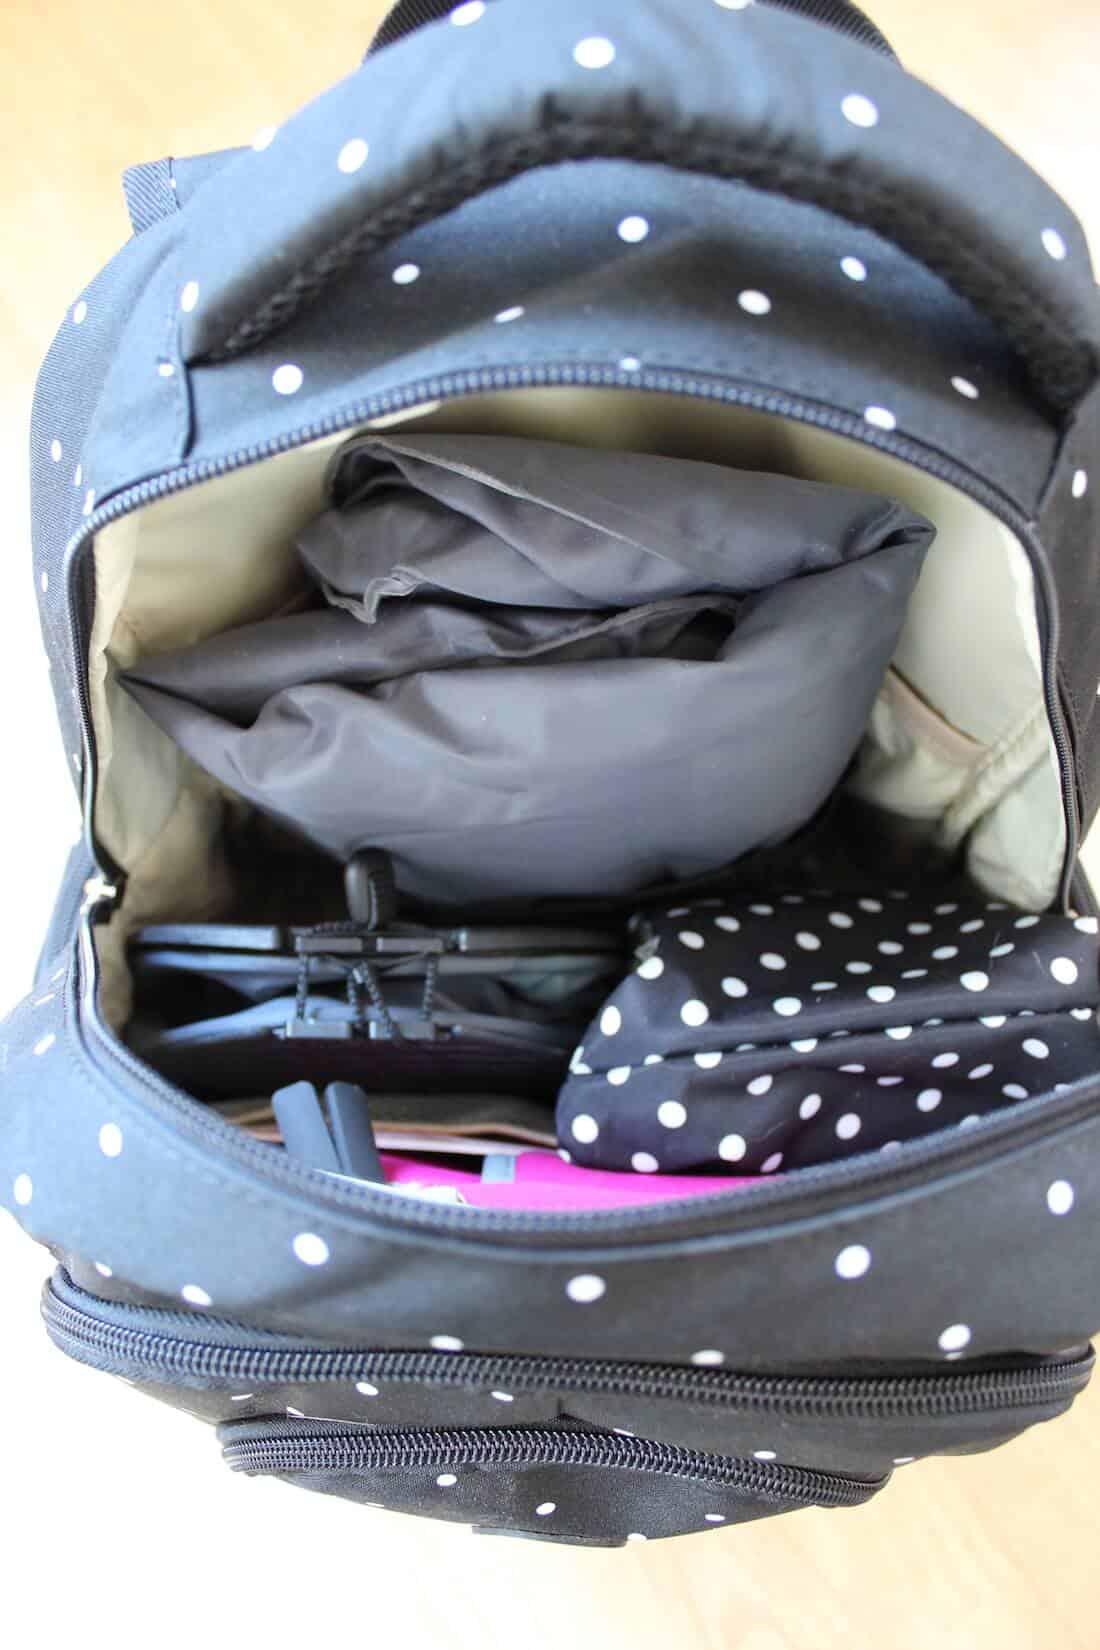 Carryon bag for plane.